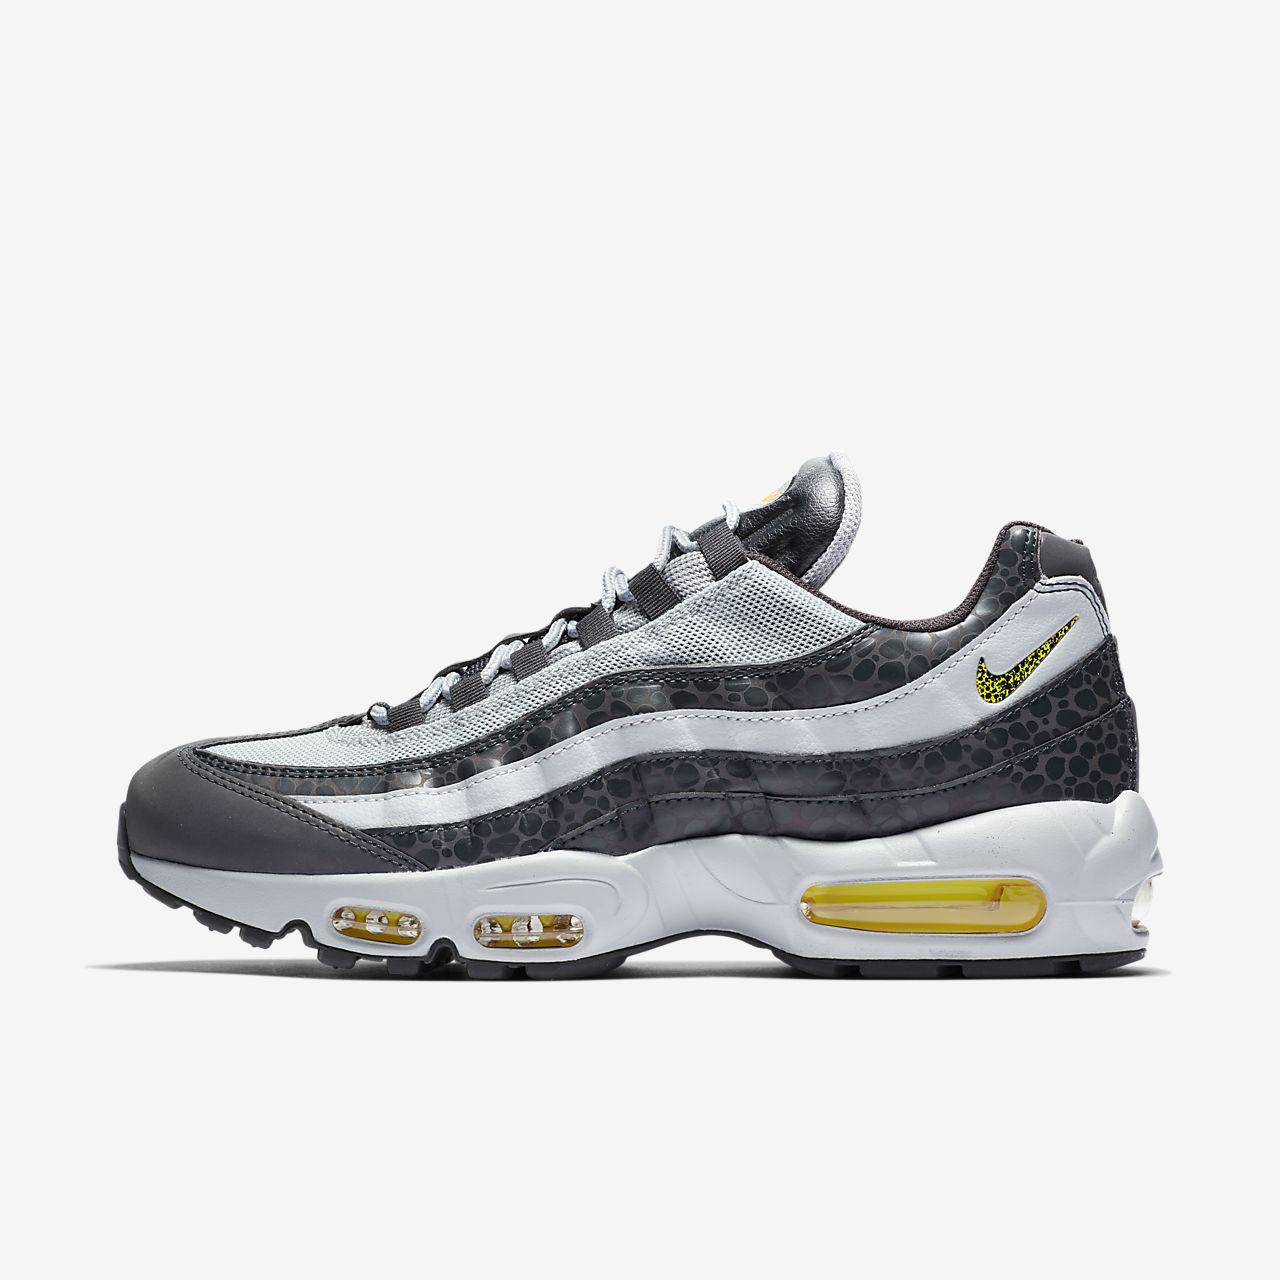 best service 8d09e 6b33e ... Nike Air Max 95 SE-sko til mænd